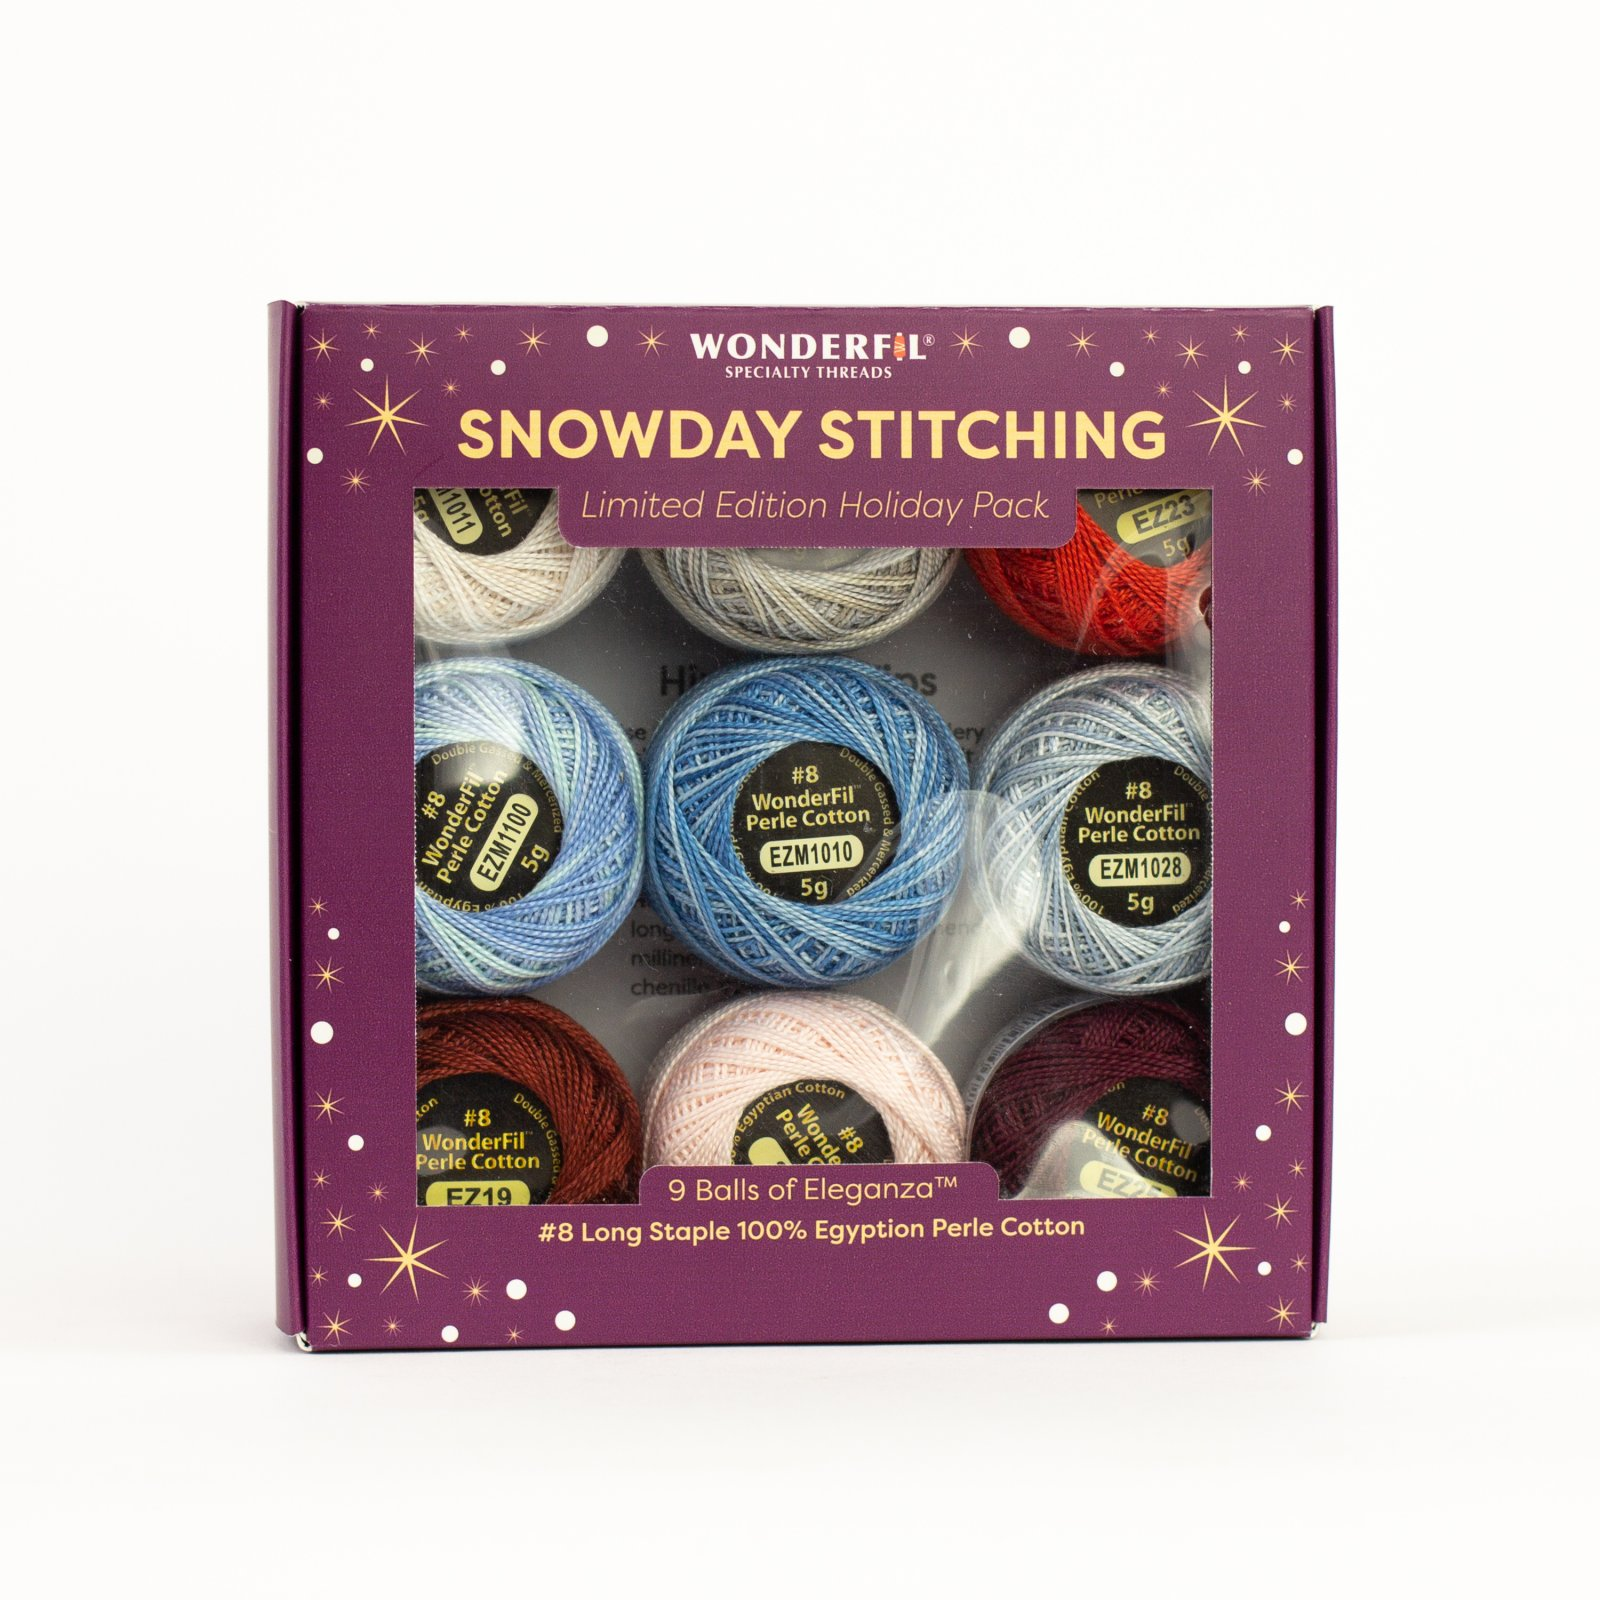 WF Snowday Stitching Ice Crystals